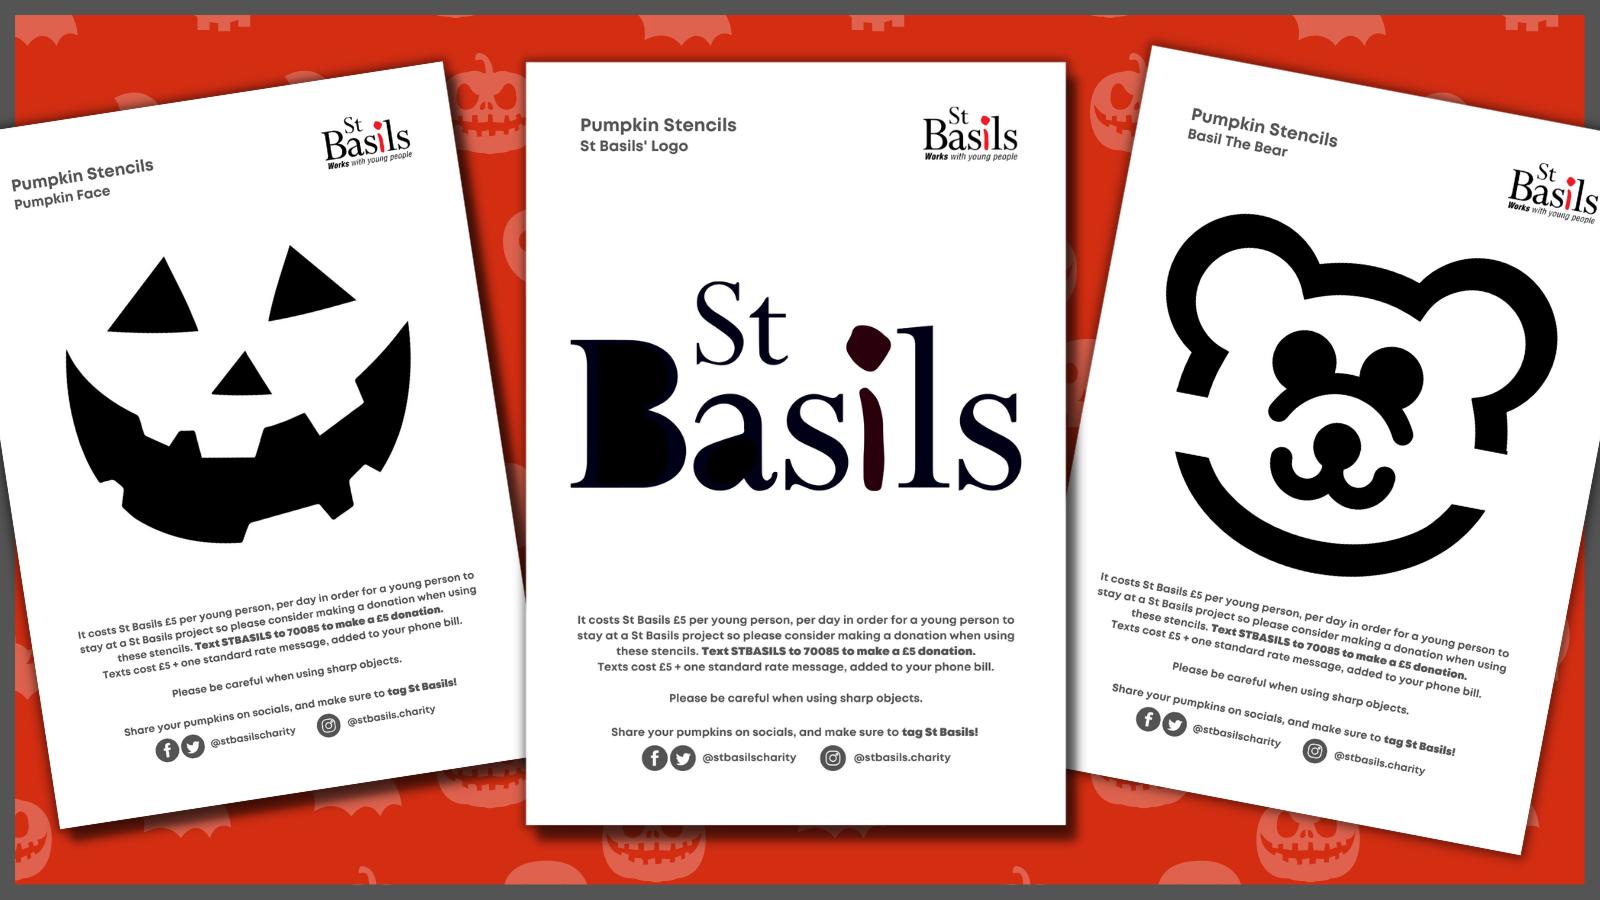 St Basils' Spook-tacular Pumpkin Stencils